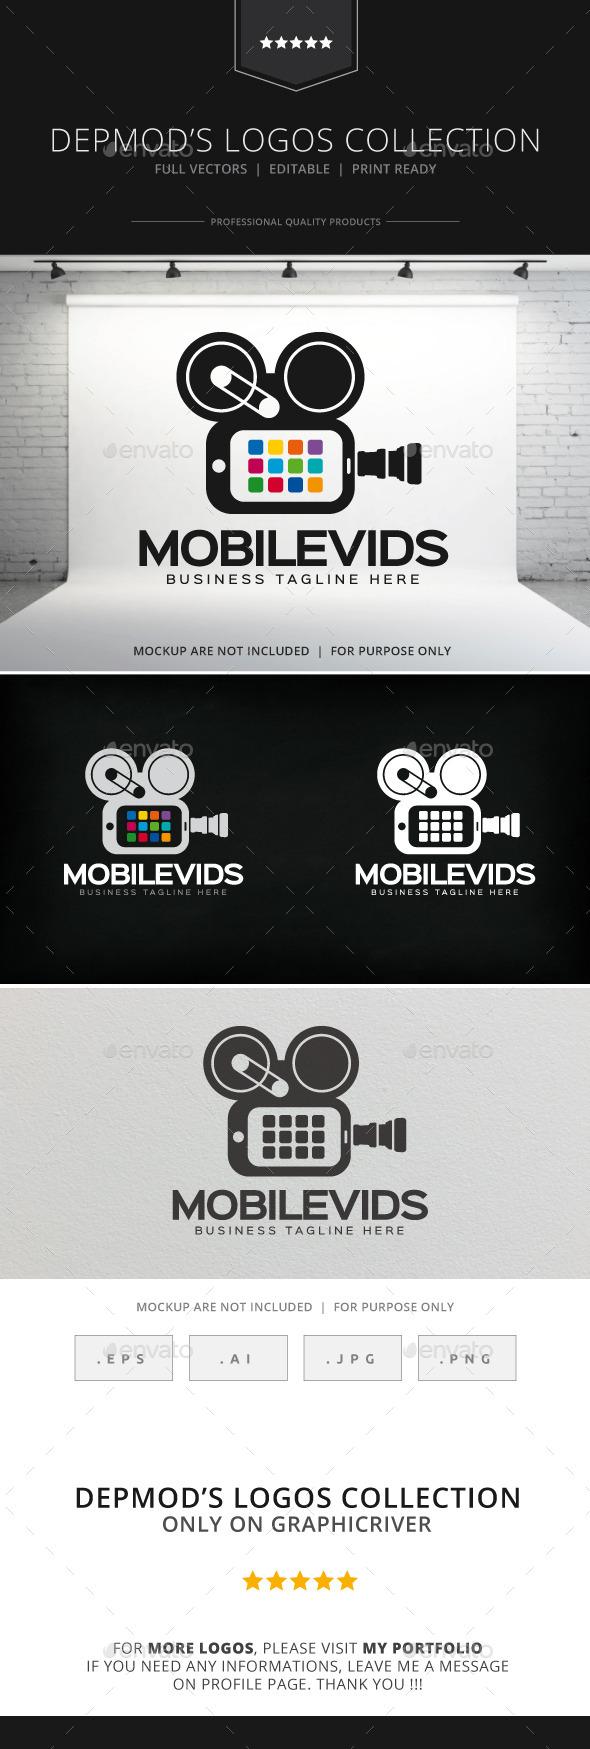 Mobile Vids Logo